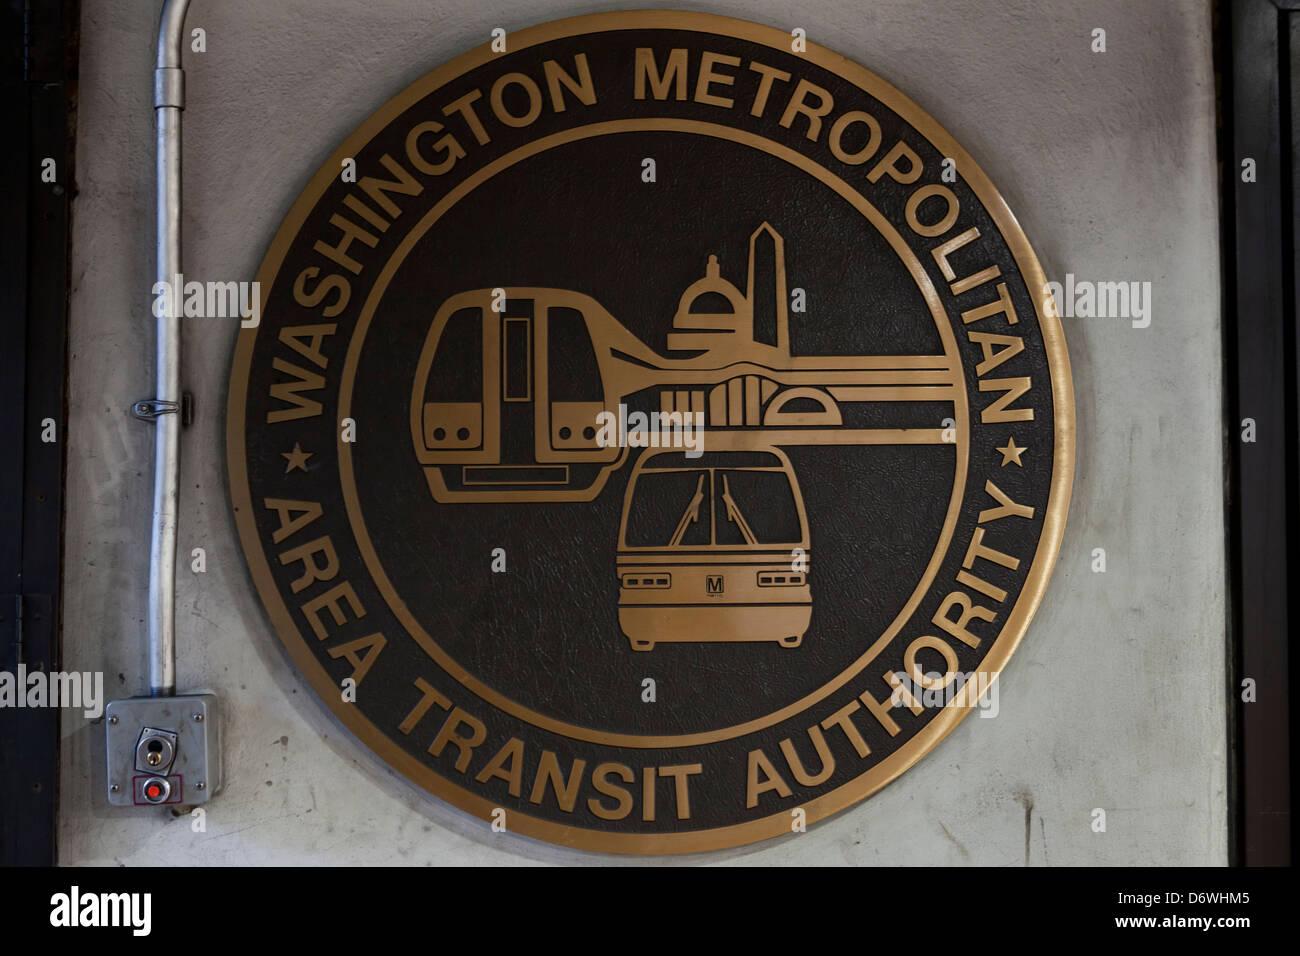 Siegel der Washington Metropolitan Area Transit Authority Stockbild